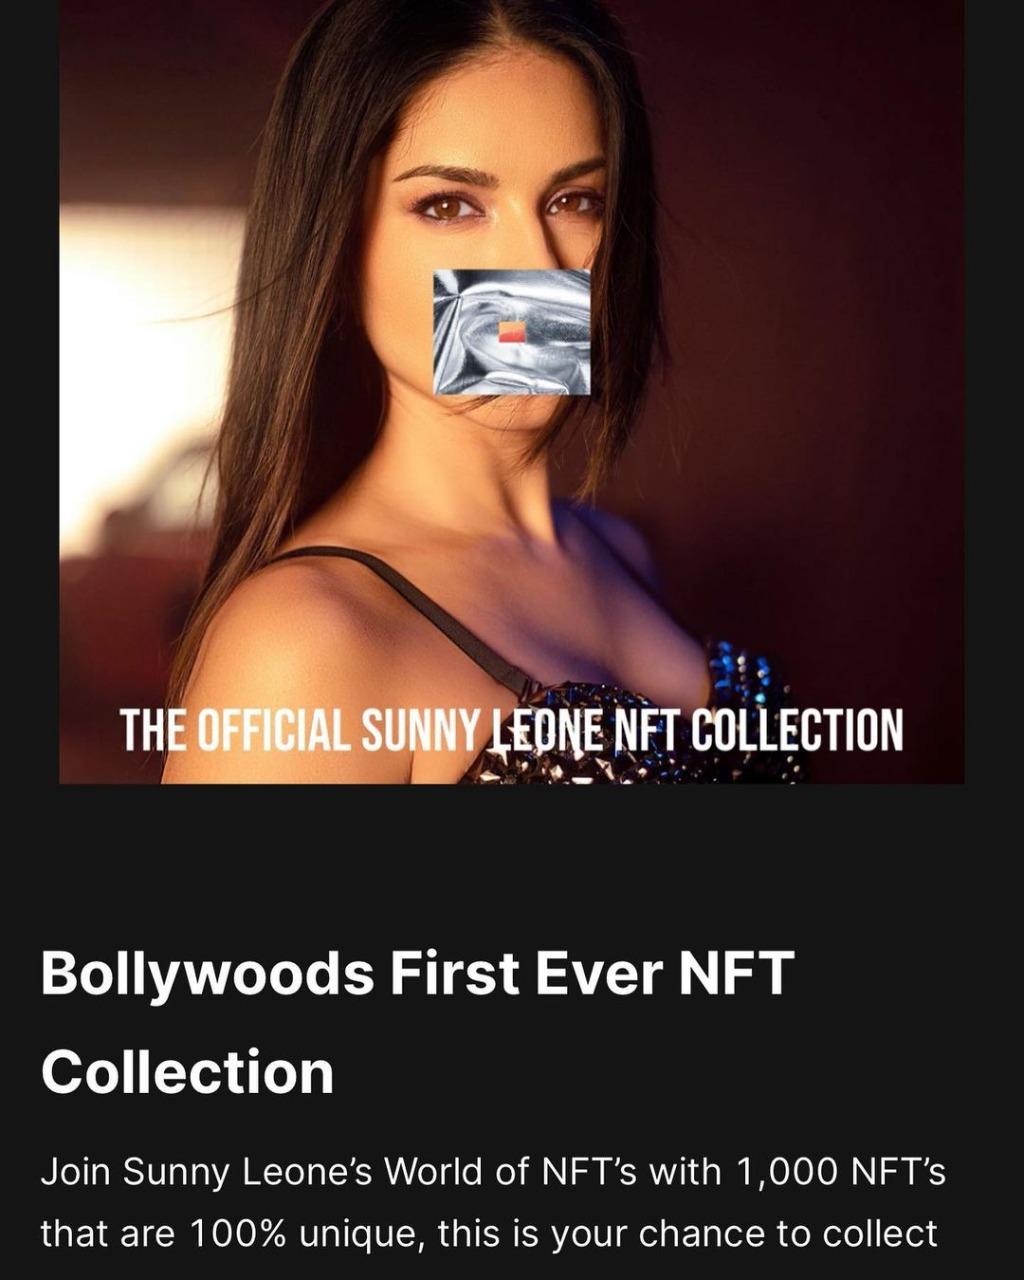 https://www.outlookindia.com/